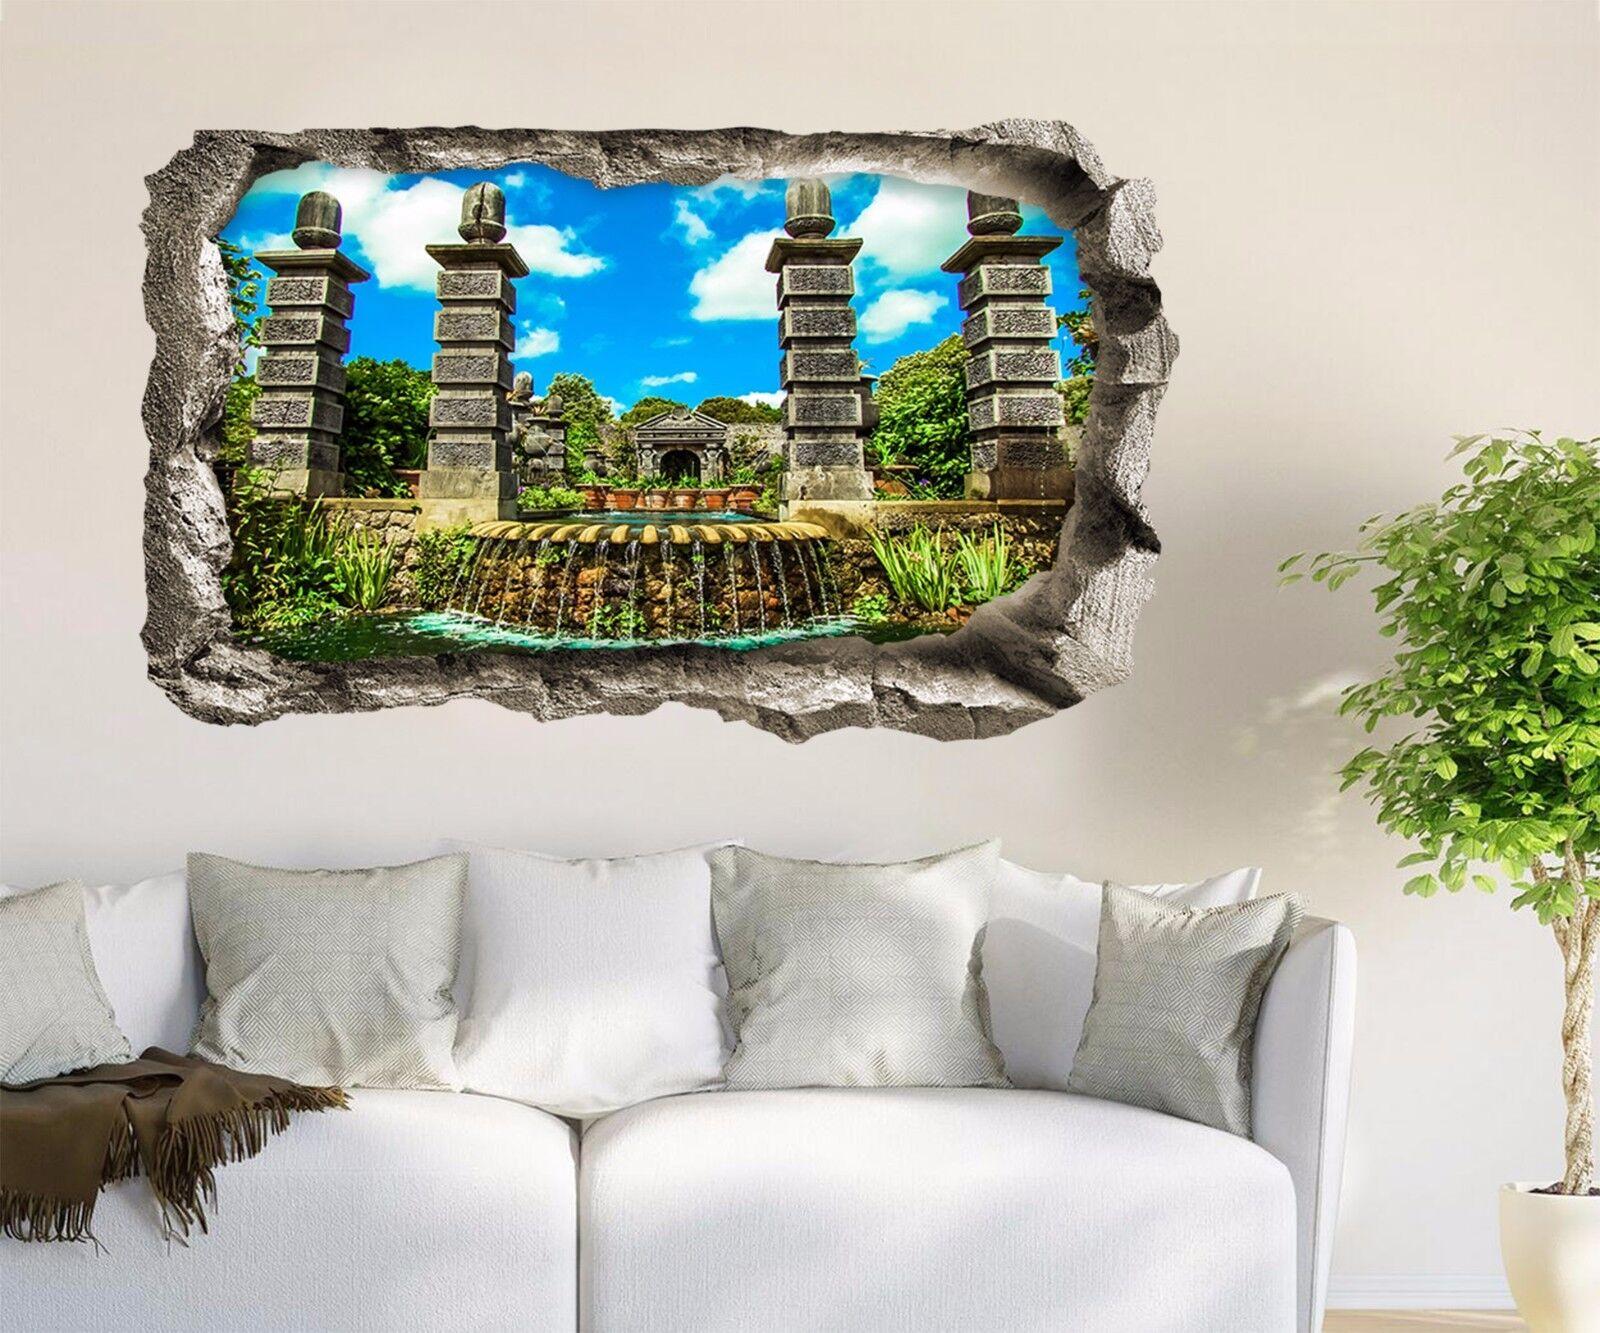 3D Bellissimo Giardino Parete Murales Adesivi Decal Sfondamento AJ WALLPAPER IT